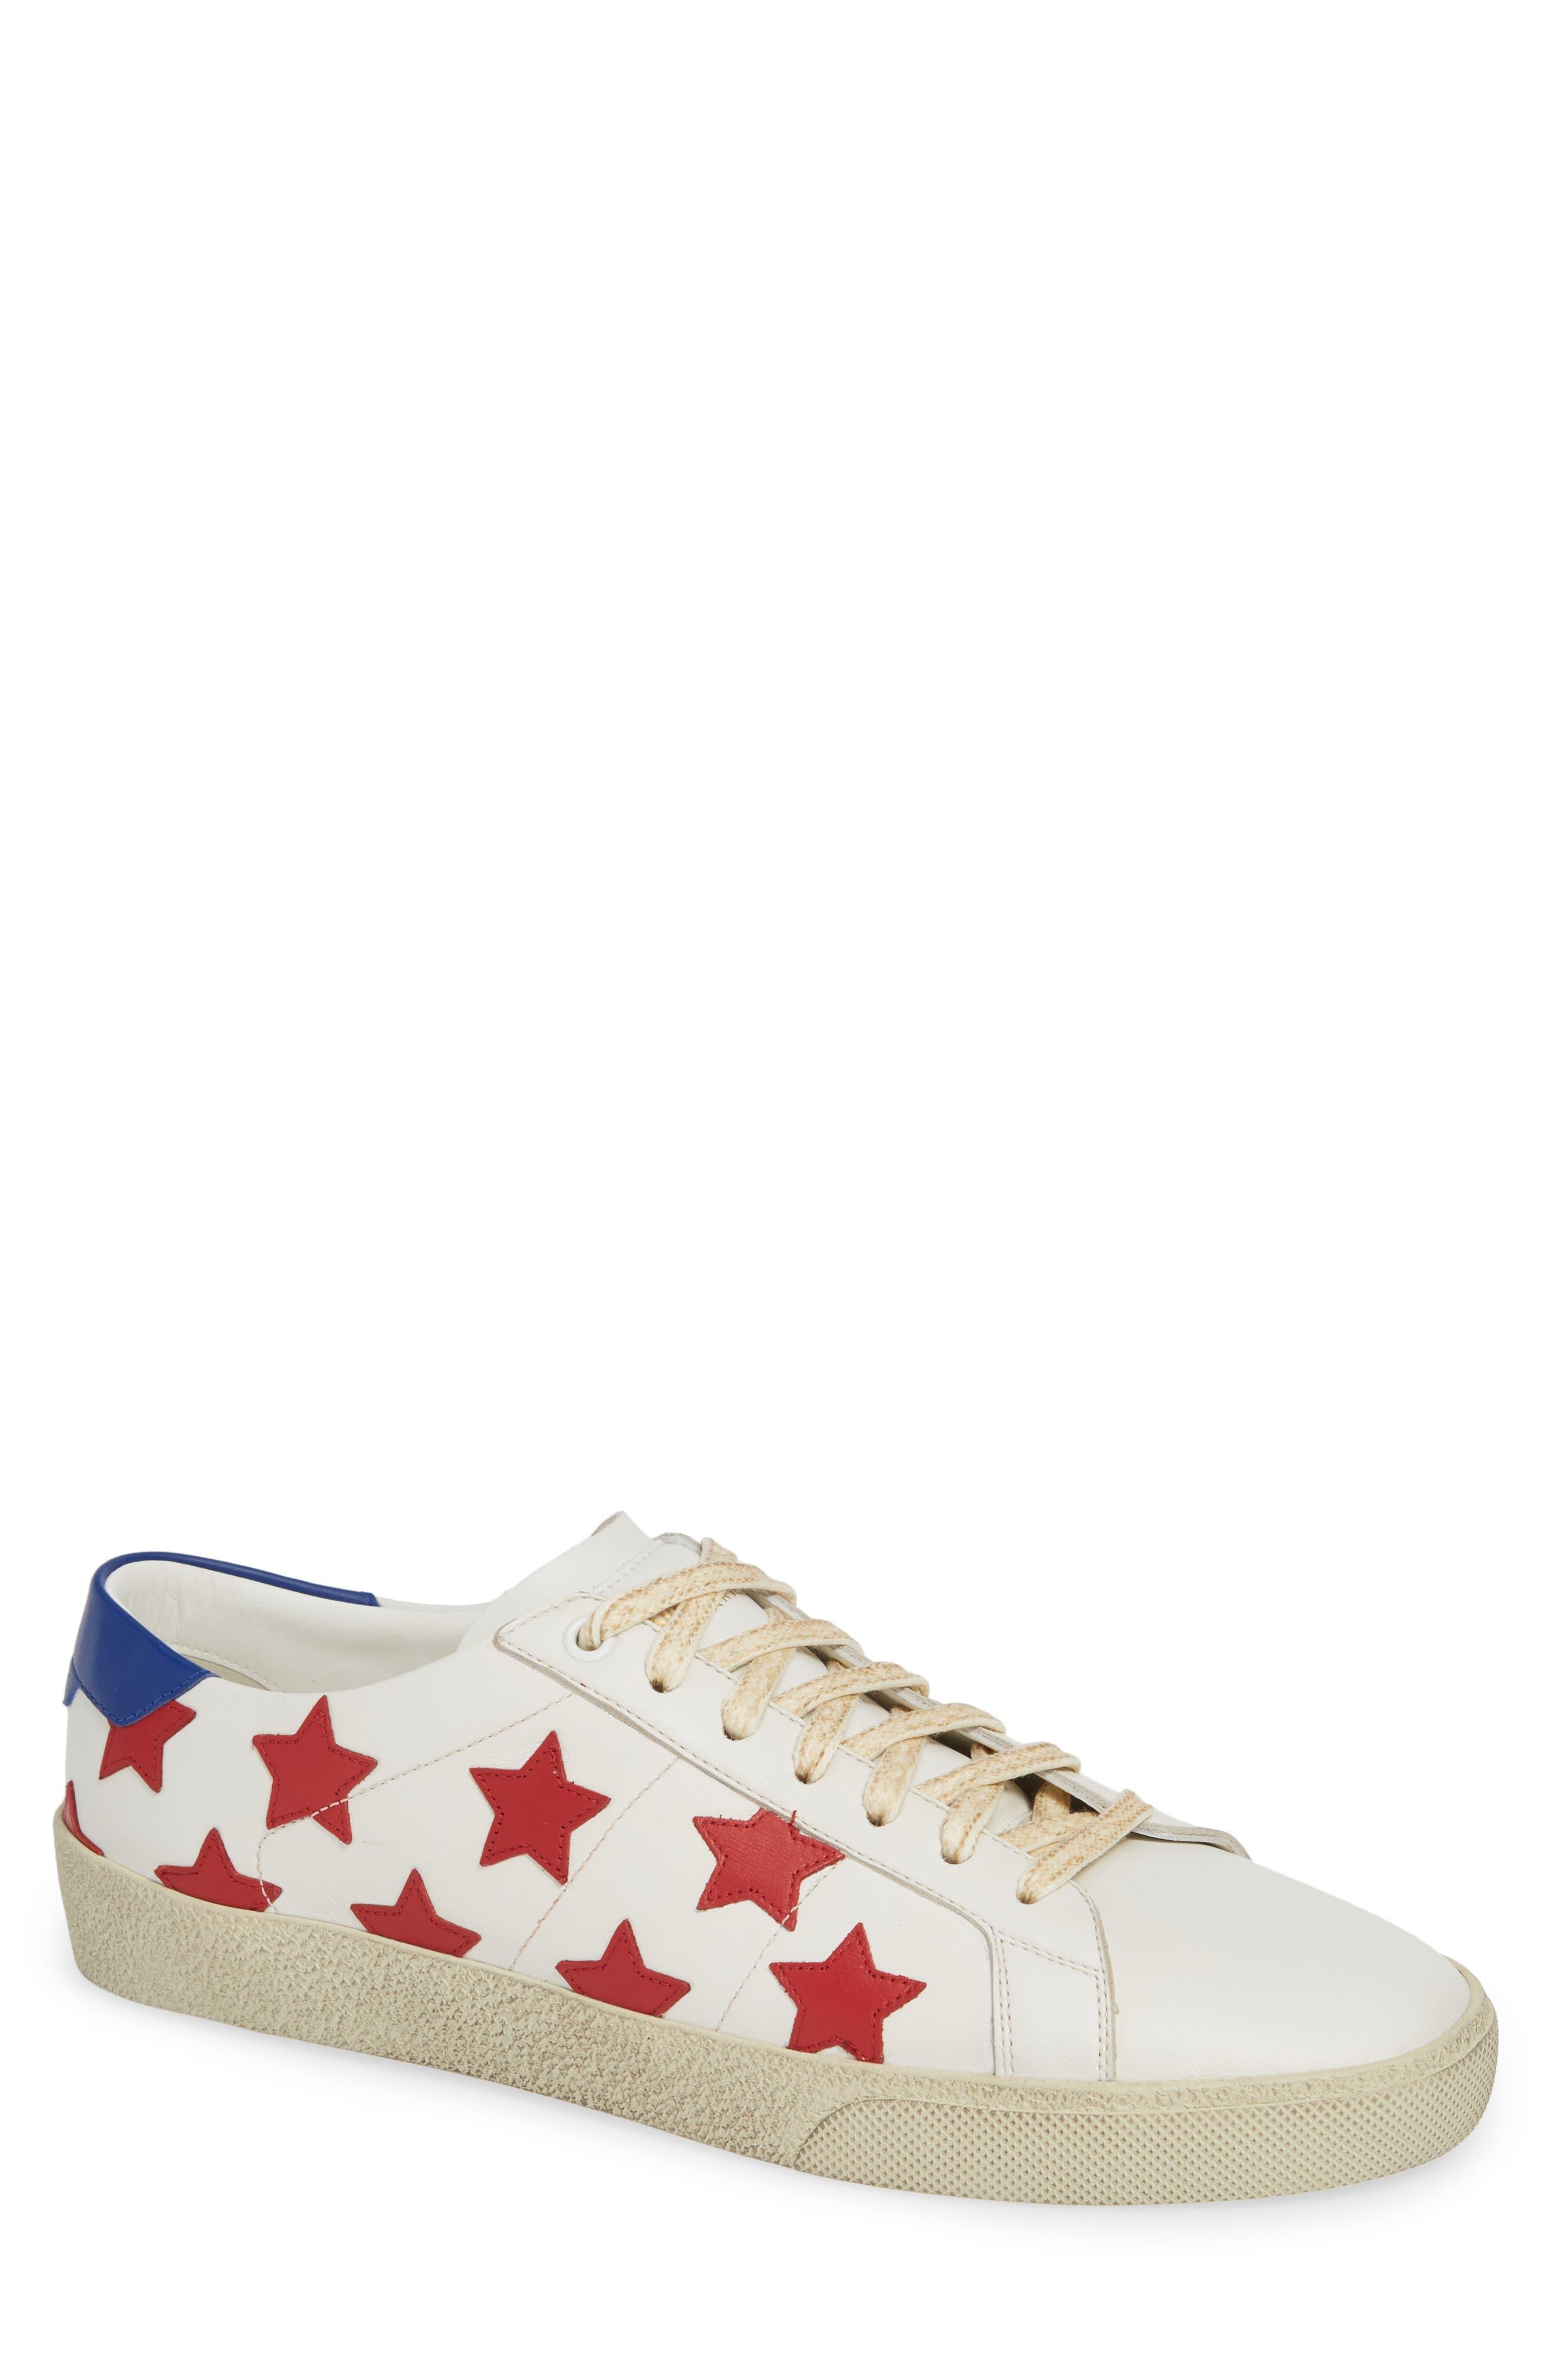 SAINT LAURENT Star Low-Top Sneaker, Main, color, WHITE/ MULTI